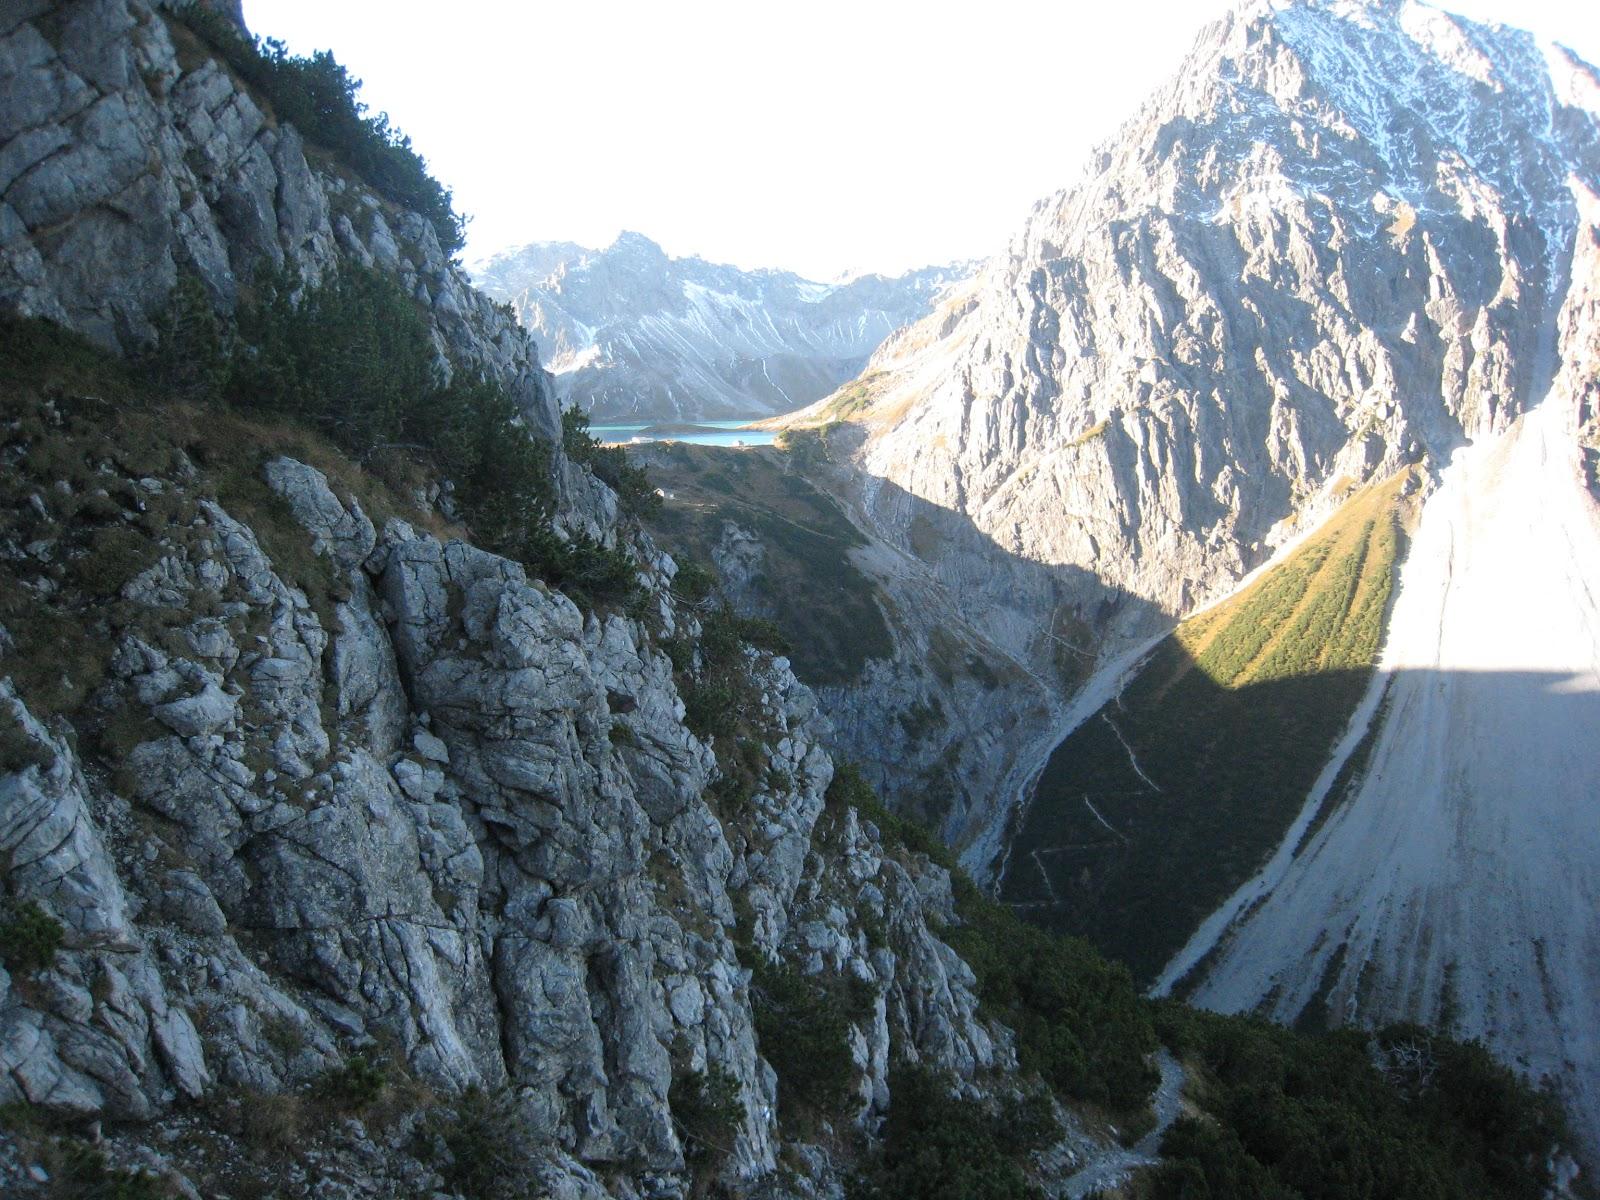 Klettersteig Saulakopf : Auf guten wegen andreas outdoor klettersteig saulakopf